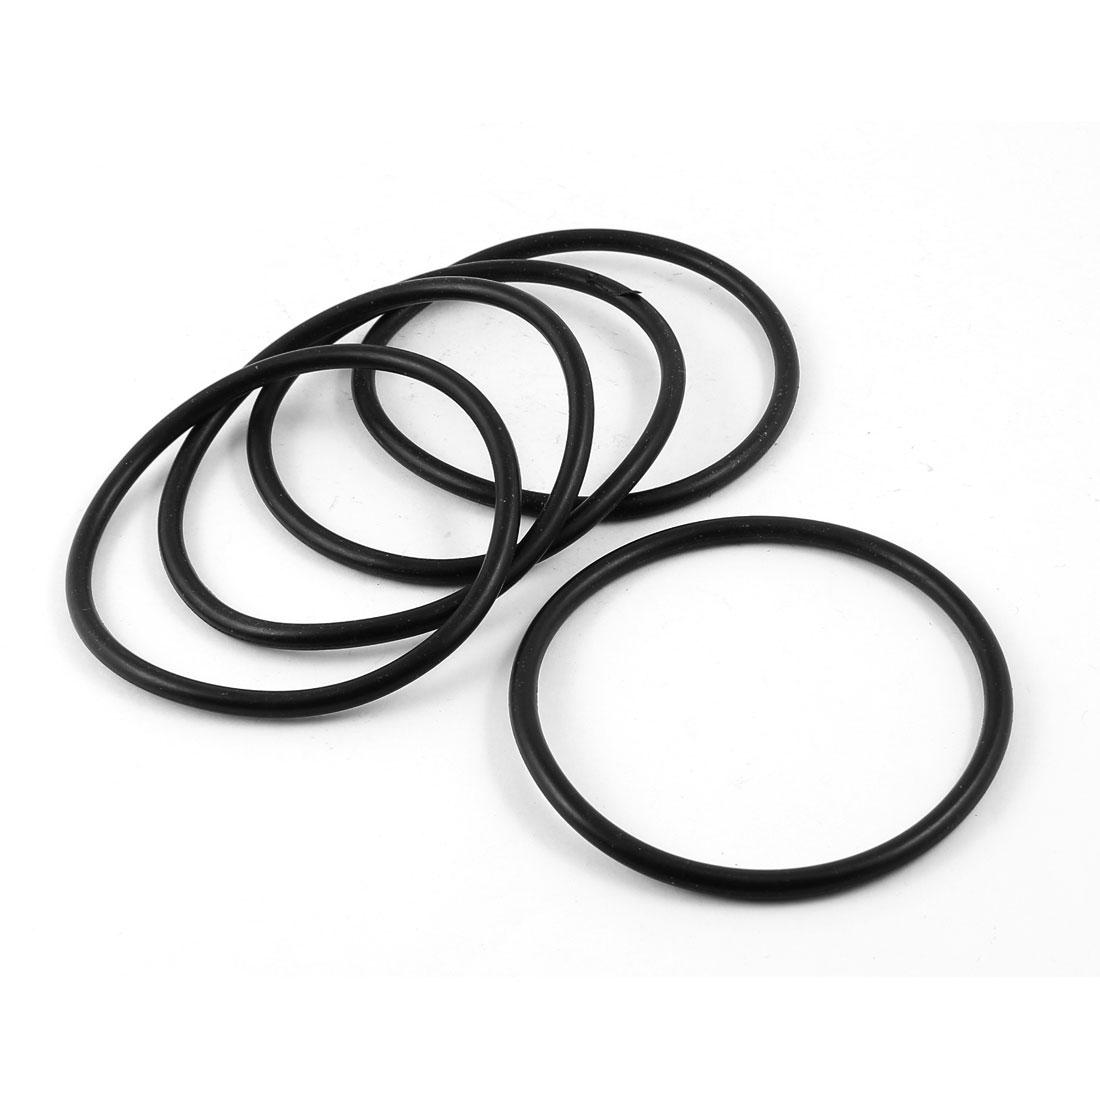 5 Pcs 90mm x 80mm 5mm Rubber Oil Sealing O Rings for Mechanical